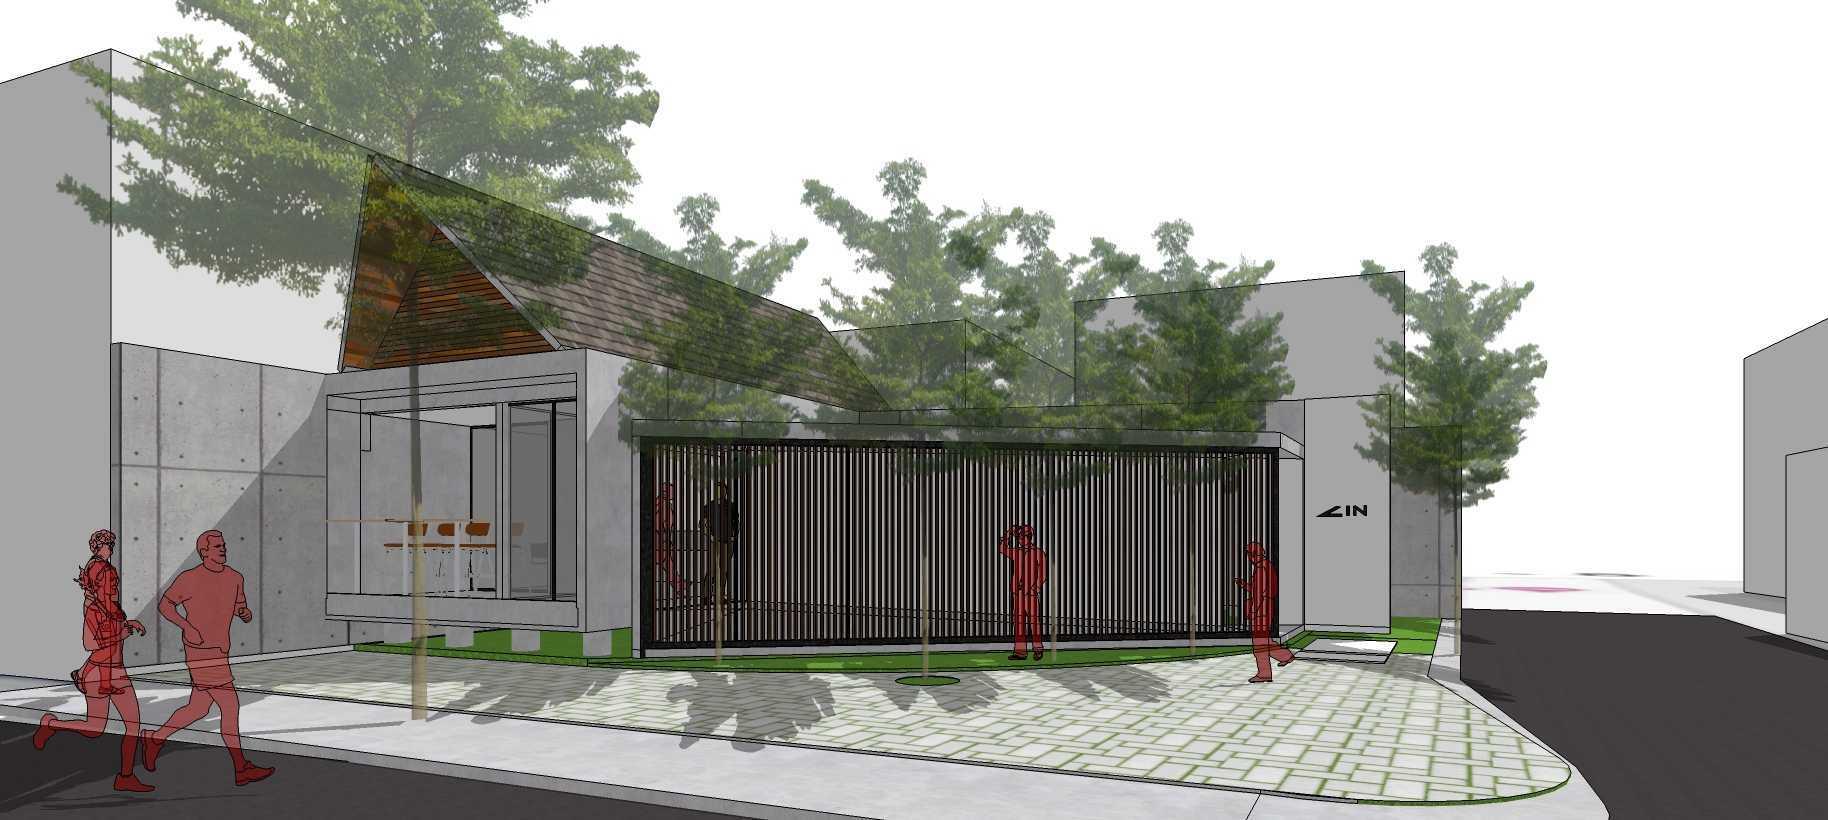 Rca  Architect Cafe At Pleburan Semarang Semarang, Kota Semarang, Jawa Tengah, Indonesia Semarang, Kota Semarang, Jawa Tengah, Indonesia Rangga-Cahya-Cafe-At-Pleburan-Semarang  116498